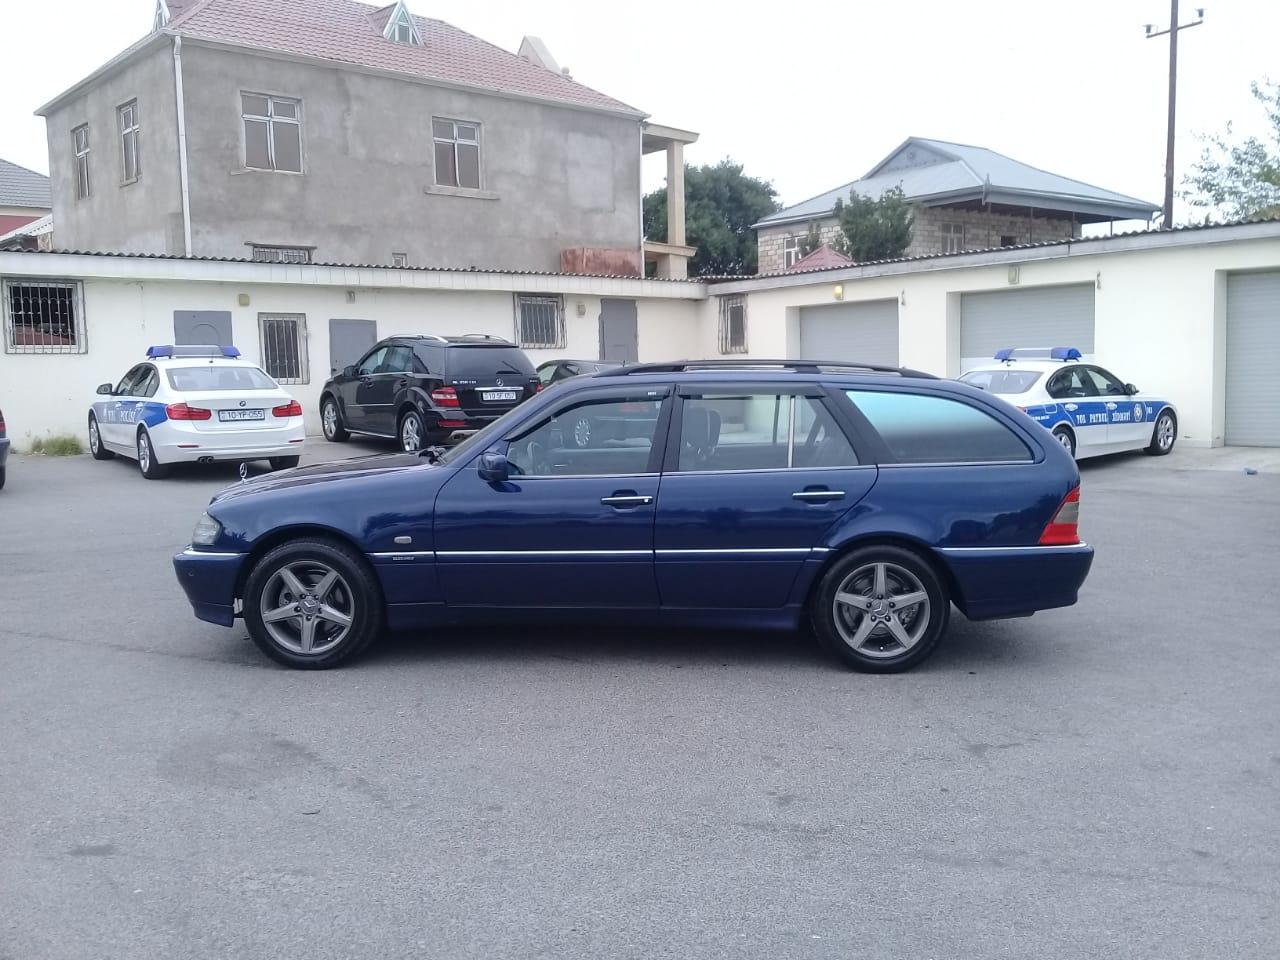 Mercedes-Benz C 230 2.3(lt) 1998 Second hand  $10300